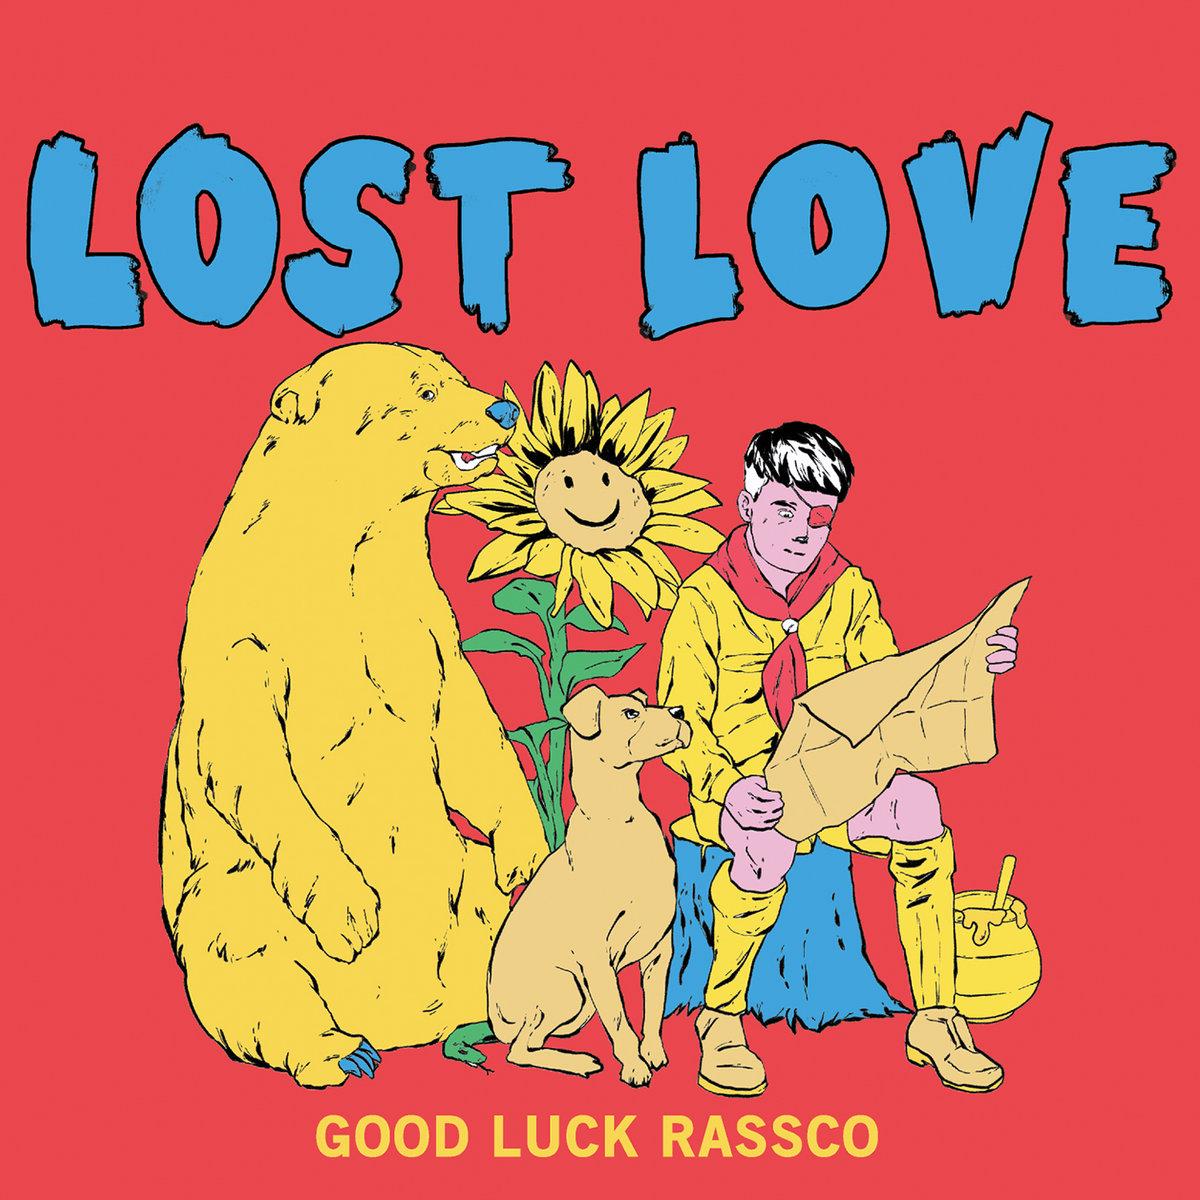 Lost Love stream their new album ''Good Luck Rassco''